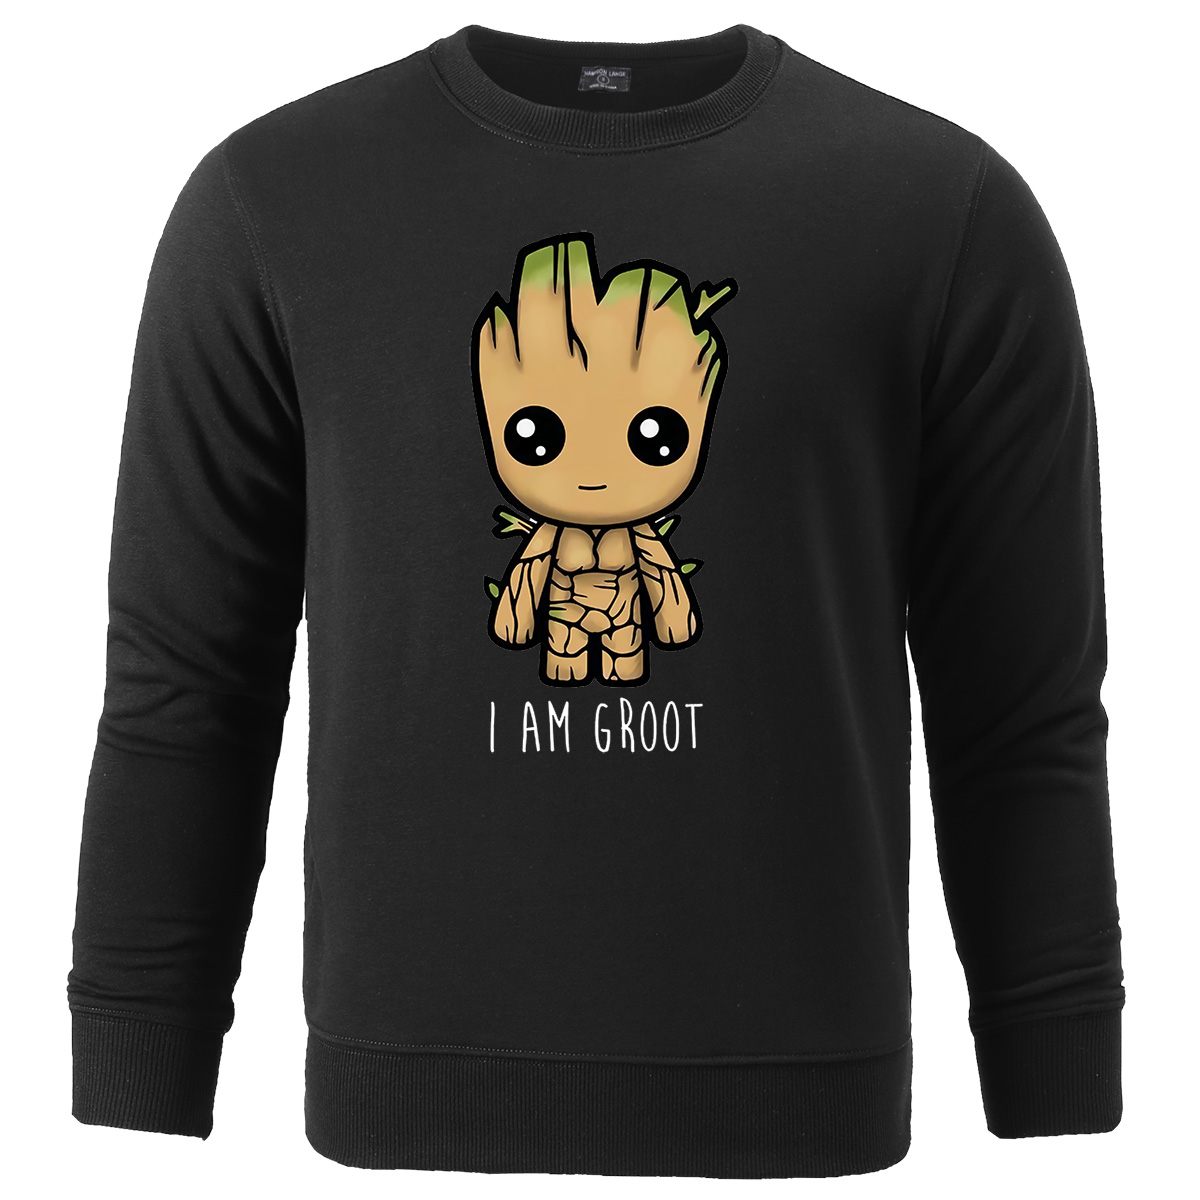 Autumn Winter 2019 Avengers I'M GROOT Printed Sweatshirts Male Casual Pullover Men Sportswear Hoodies Fleece Men's Sweatshirt